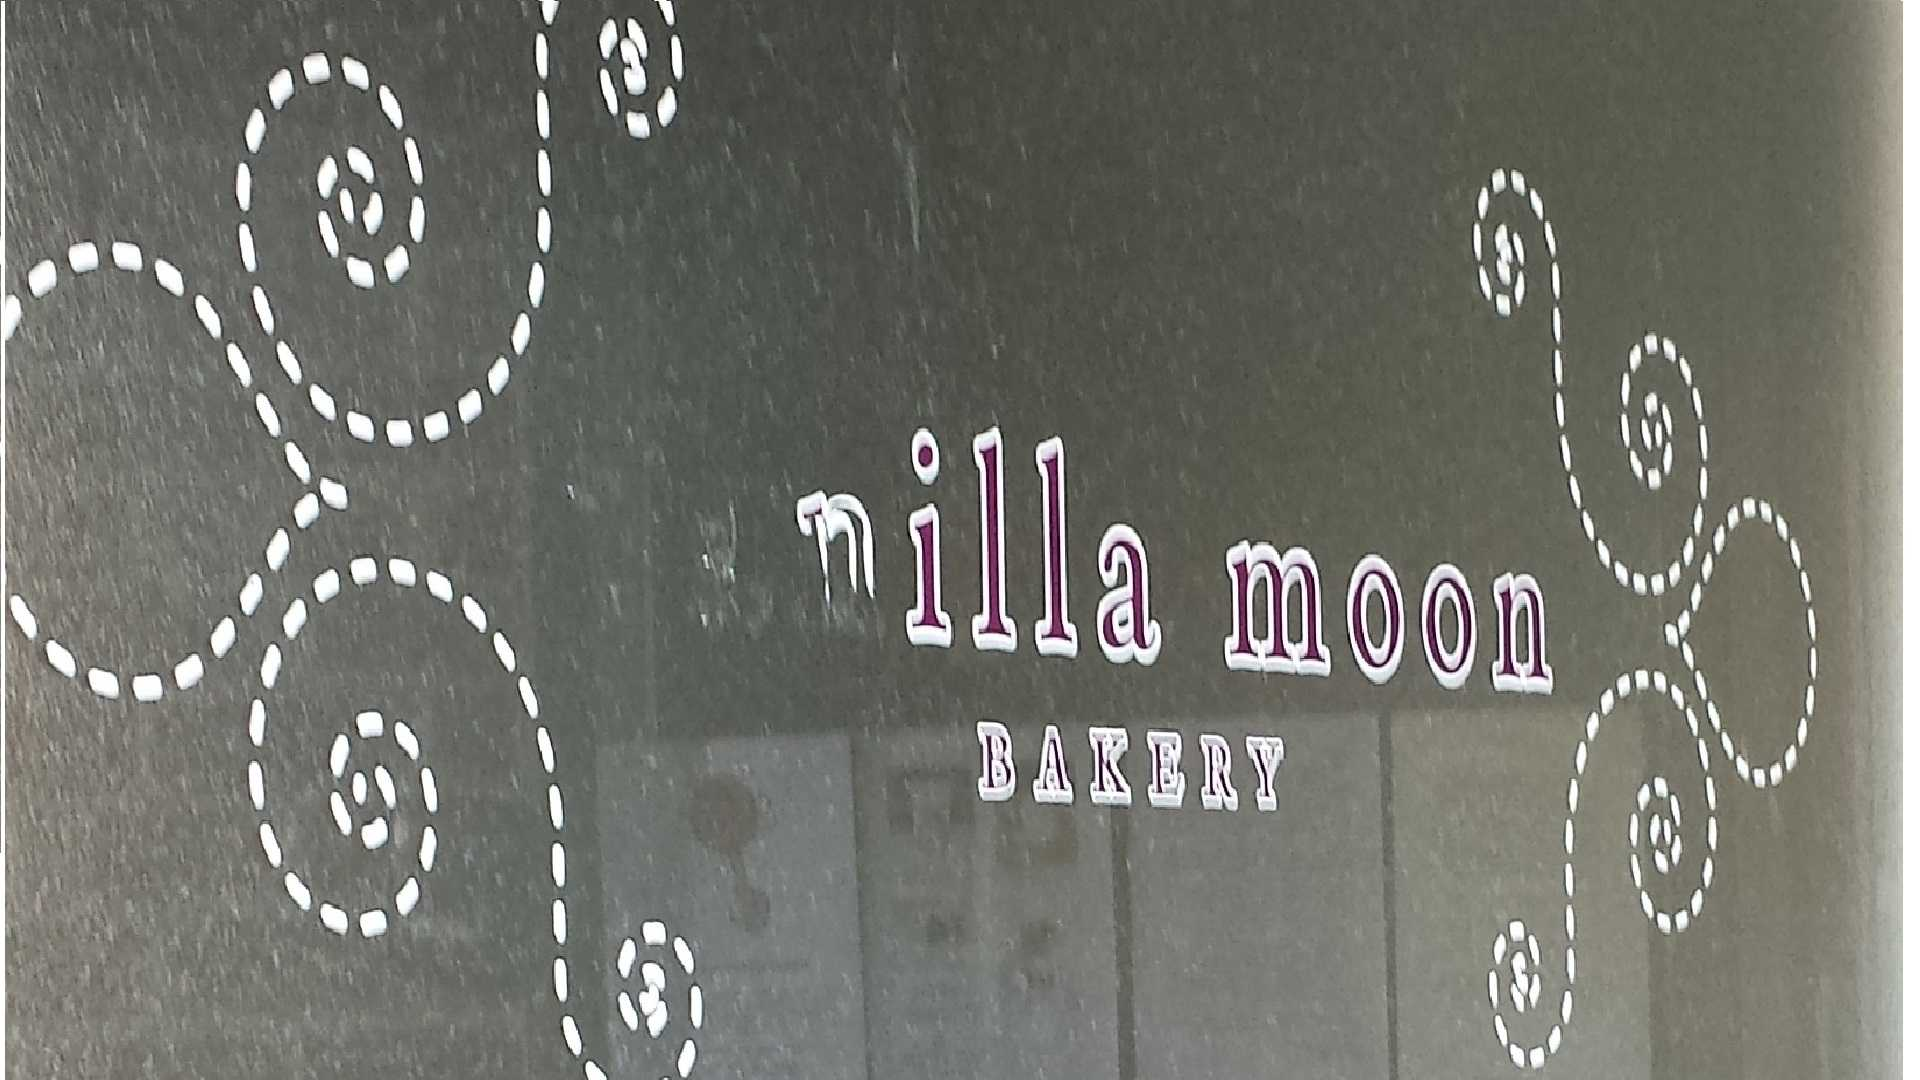 Vanilla Moon, a small bakery in San Carlos, closed on Dec. 31, 2016.